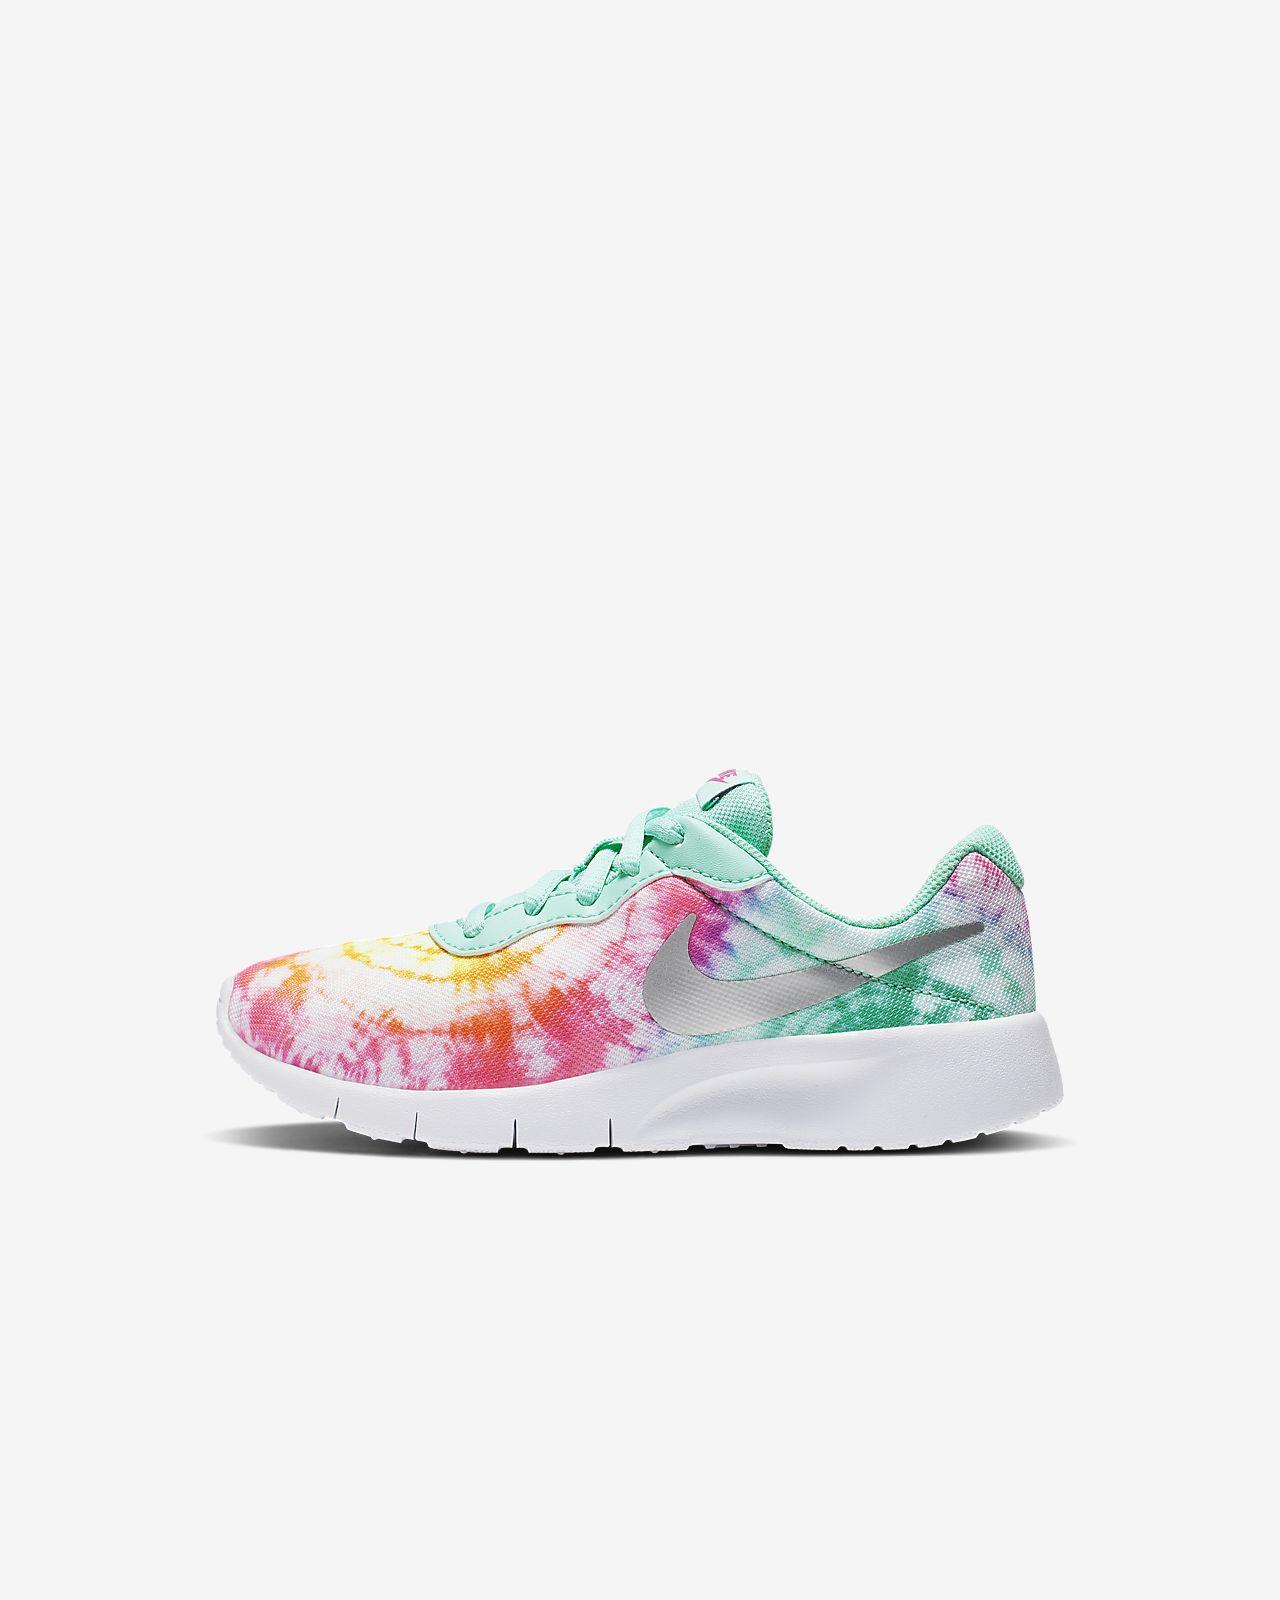 a23634a82f Nike Tanjun Print Little Kids' Shoe. Nike.com